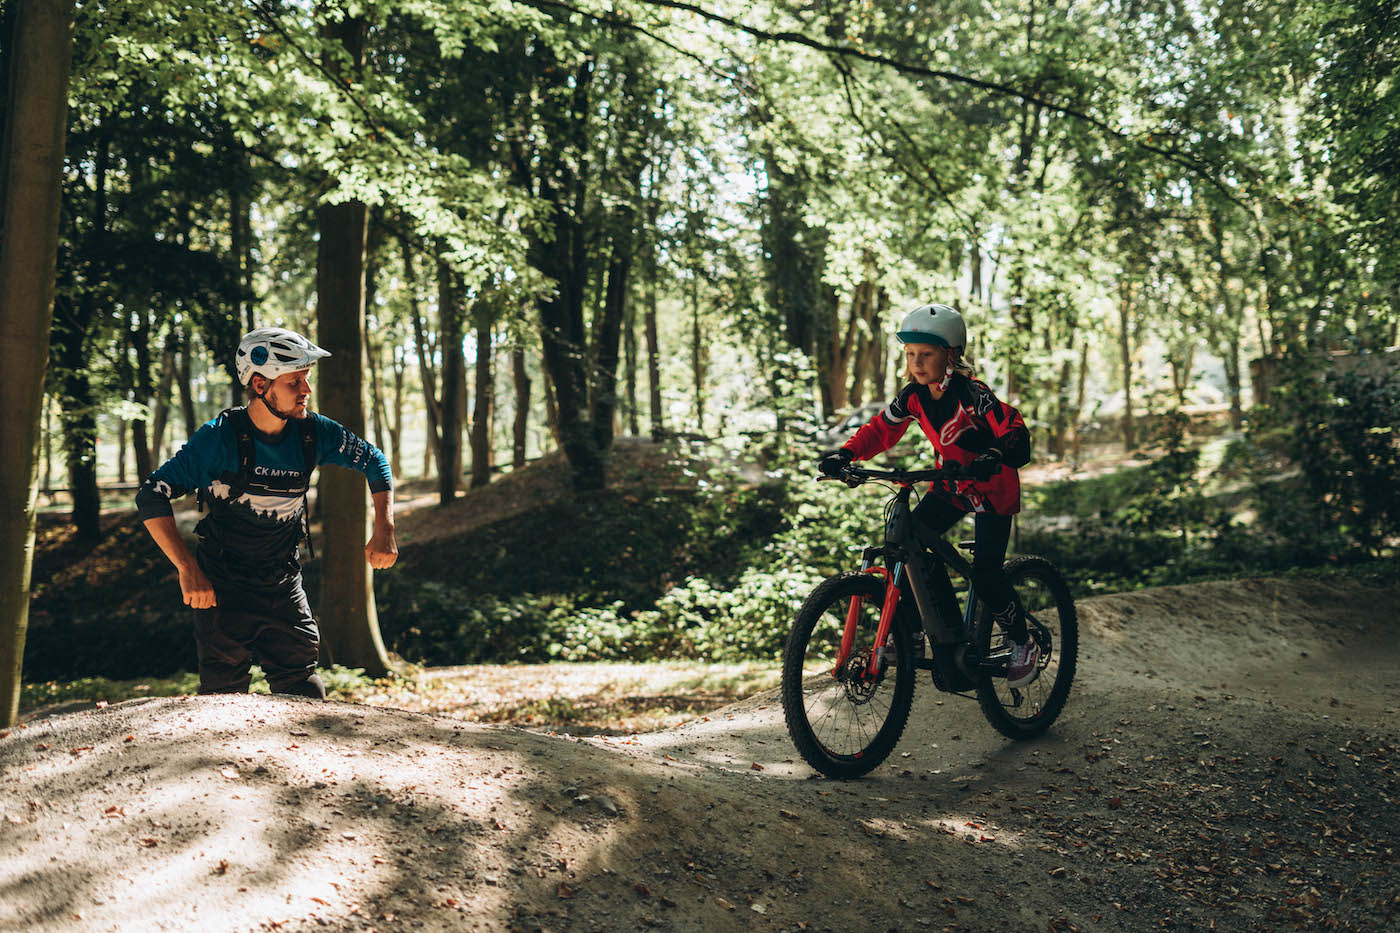 Mountainbike Kinder Kurs in Hannover |Bad Salzdetfurth - 8-12 Jahre Kids - Rock my Trail Fahrtechnik Bikeschule